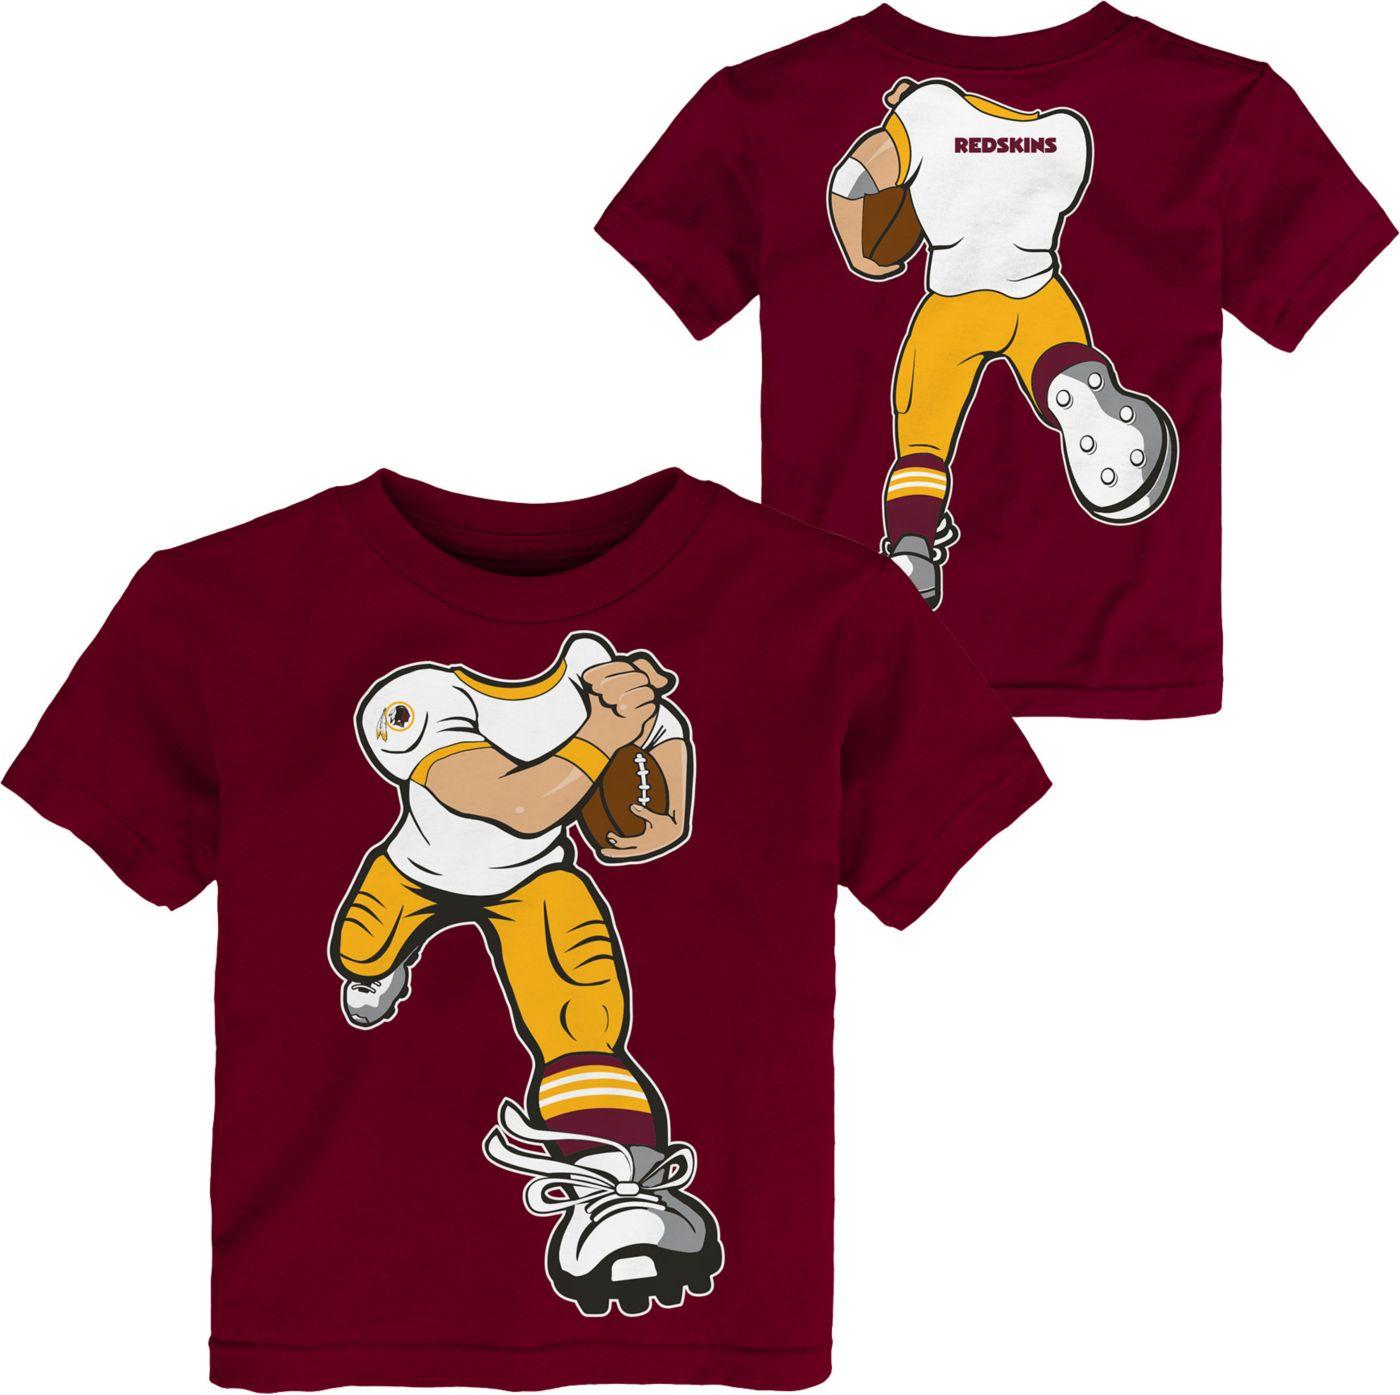 NFL Team Apparel Toddler Washington Redskins Rush Red T-Shirt